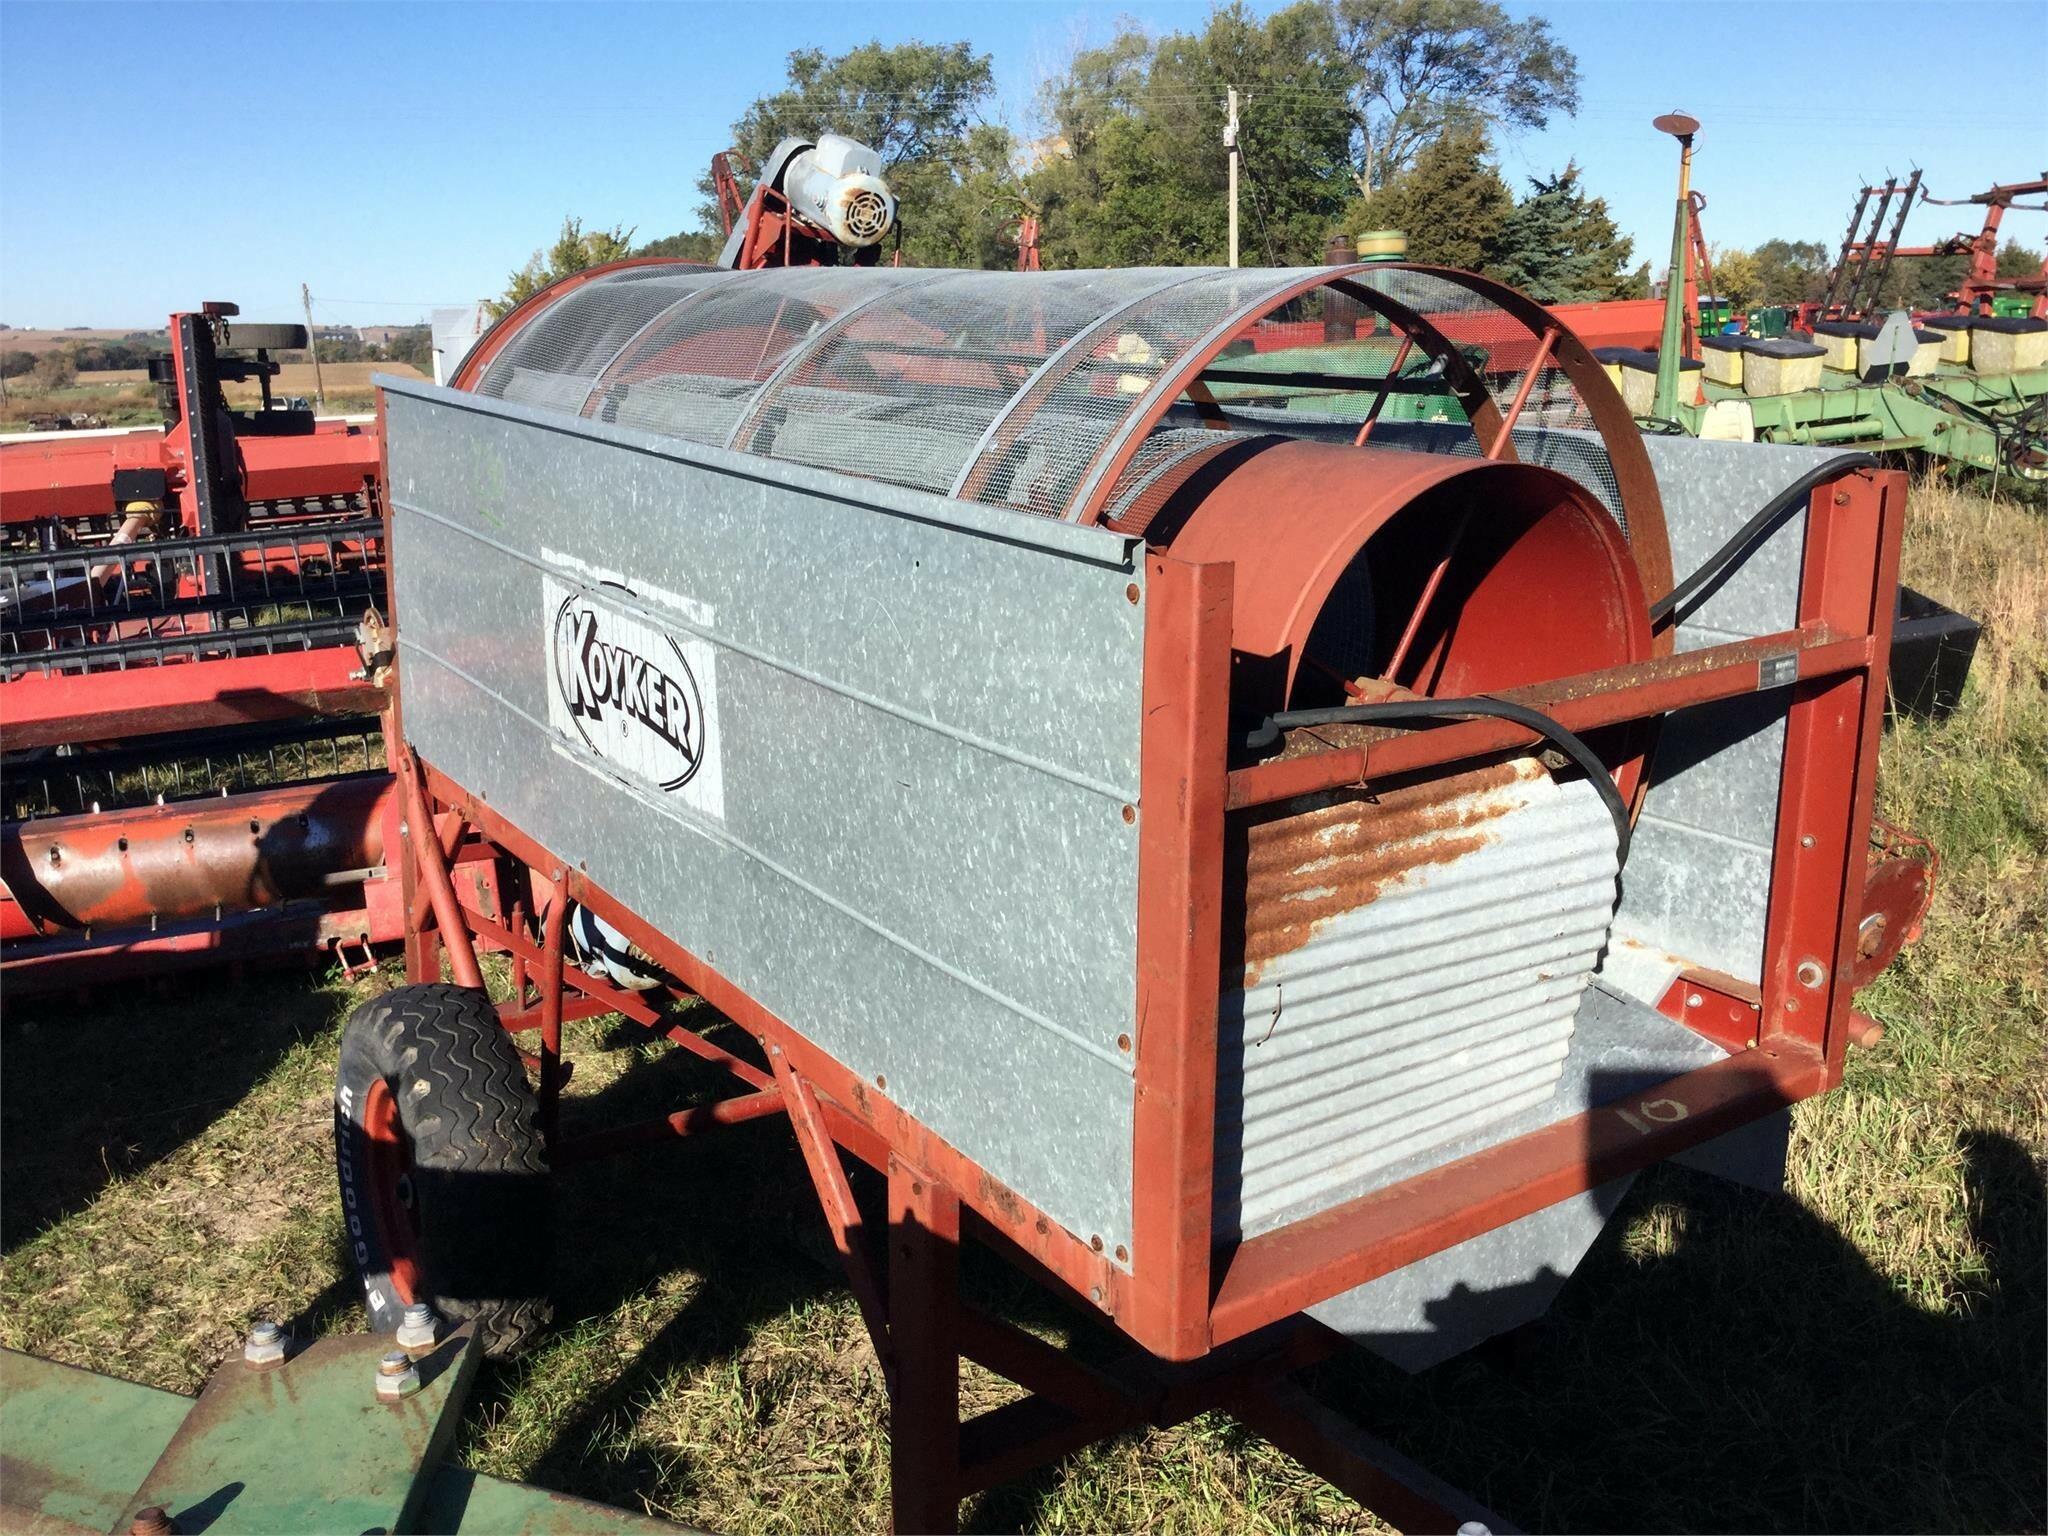 Koyker 42 Grain Cleaner